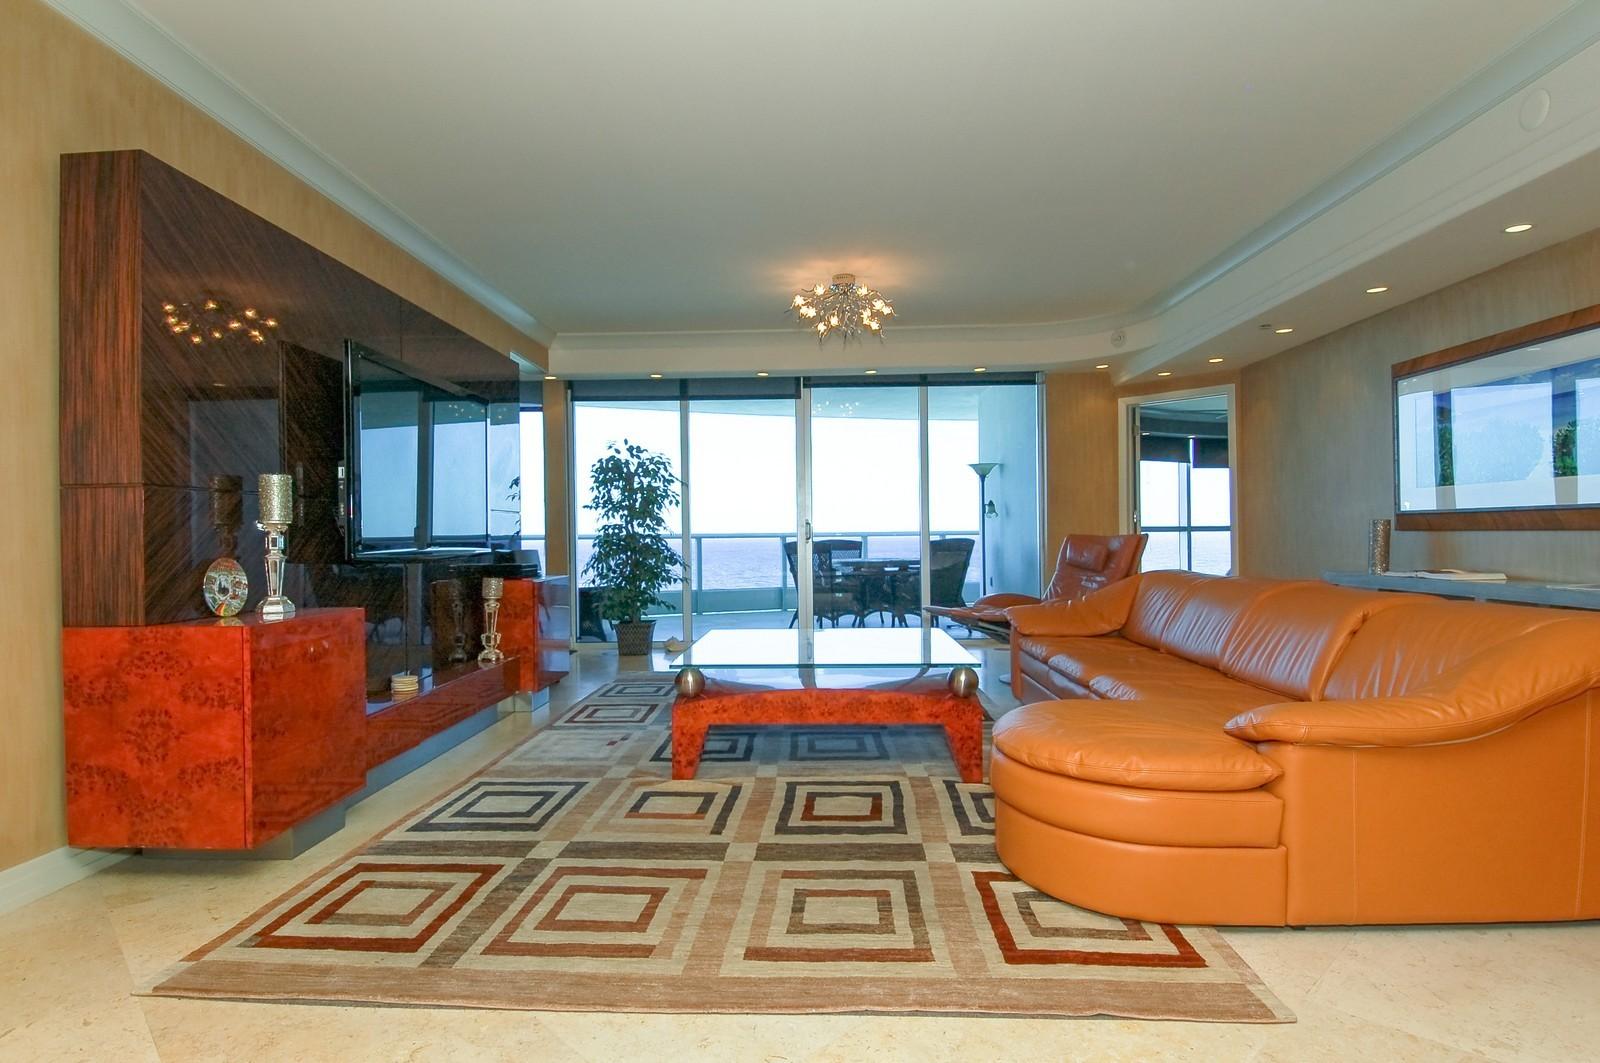 Real Estate Photography - 1600 S Ocean Blvd, Apt 802, Pompano Beach, FL, 33062 - Living Room